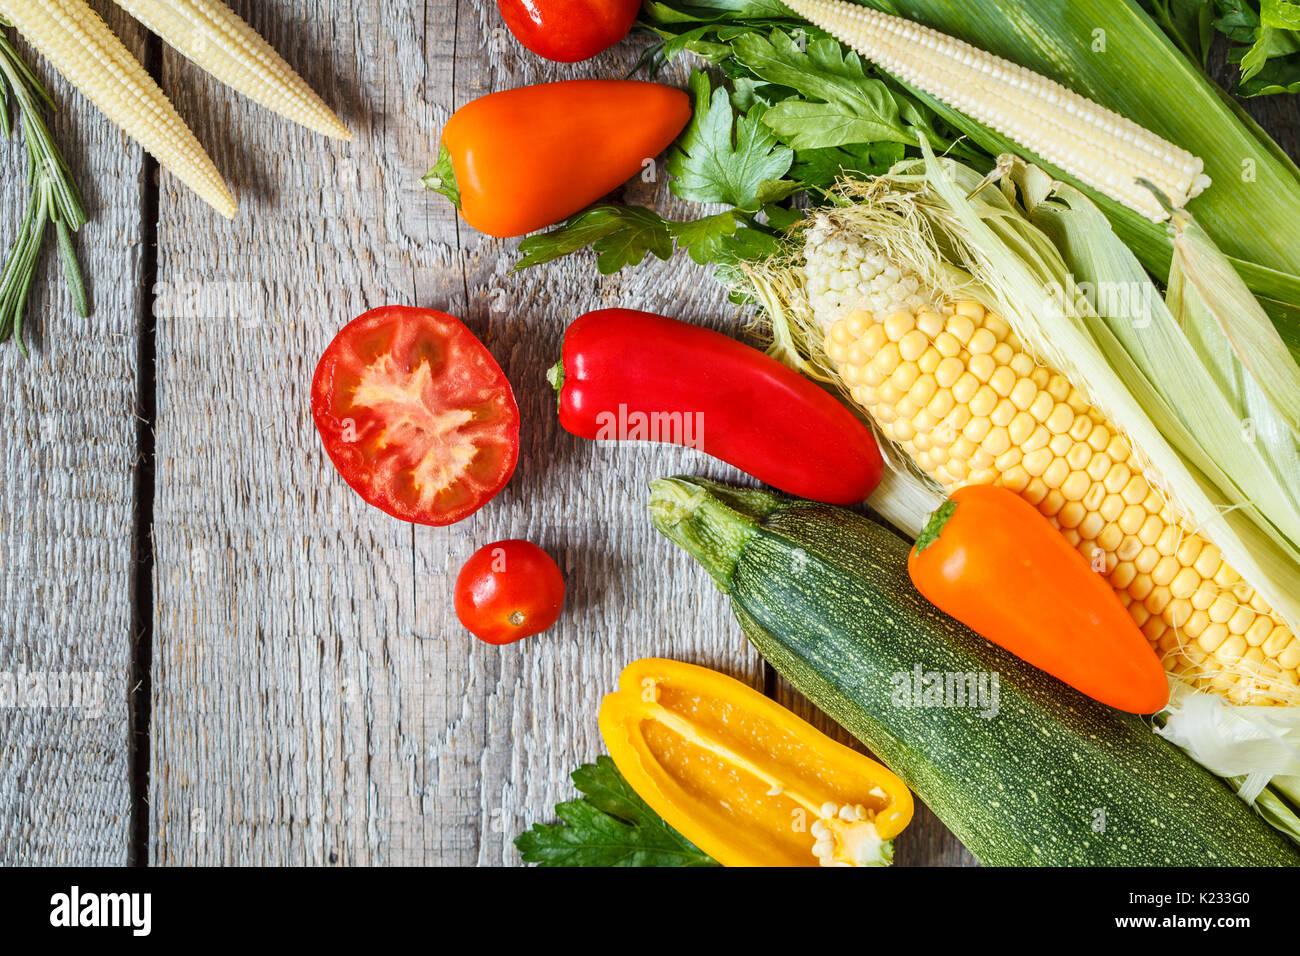 Vegan background. Ingredients for a vegetarian diet. - Stock Image